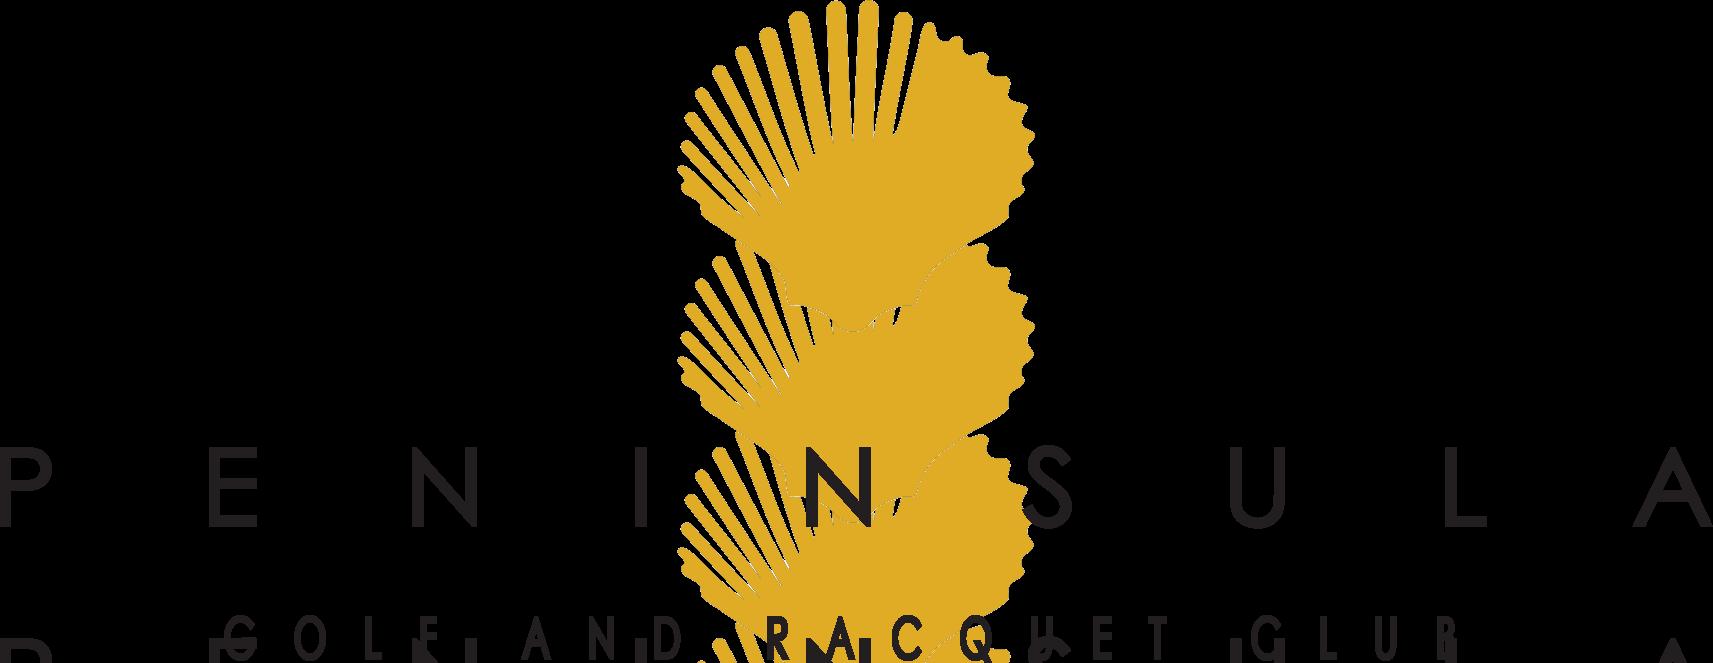 Peninsula Golf & Racquet Club's Logo